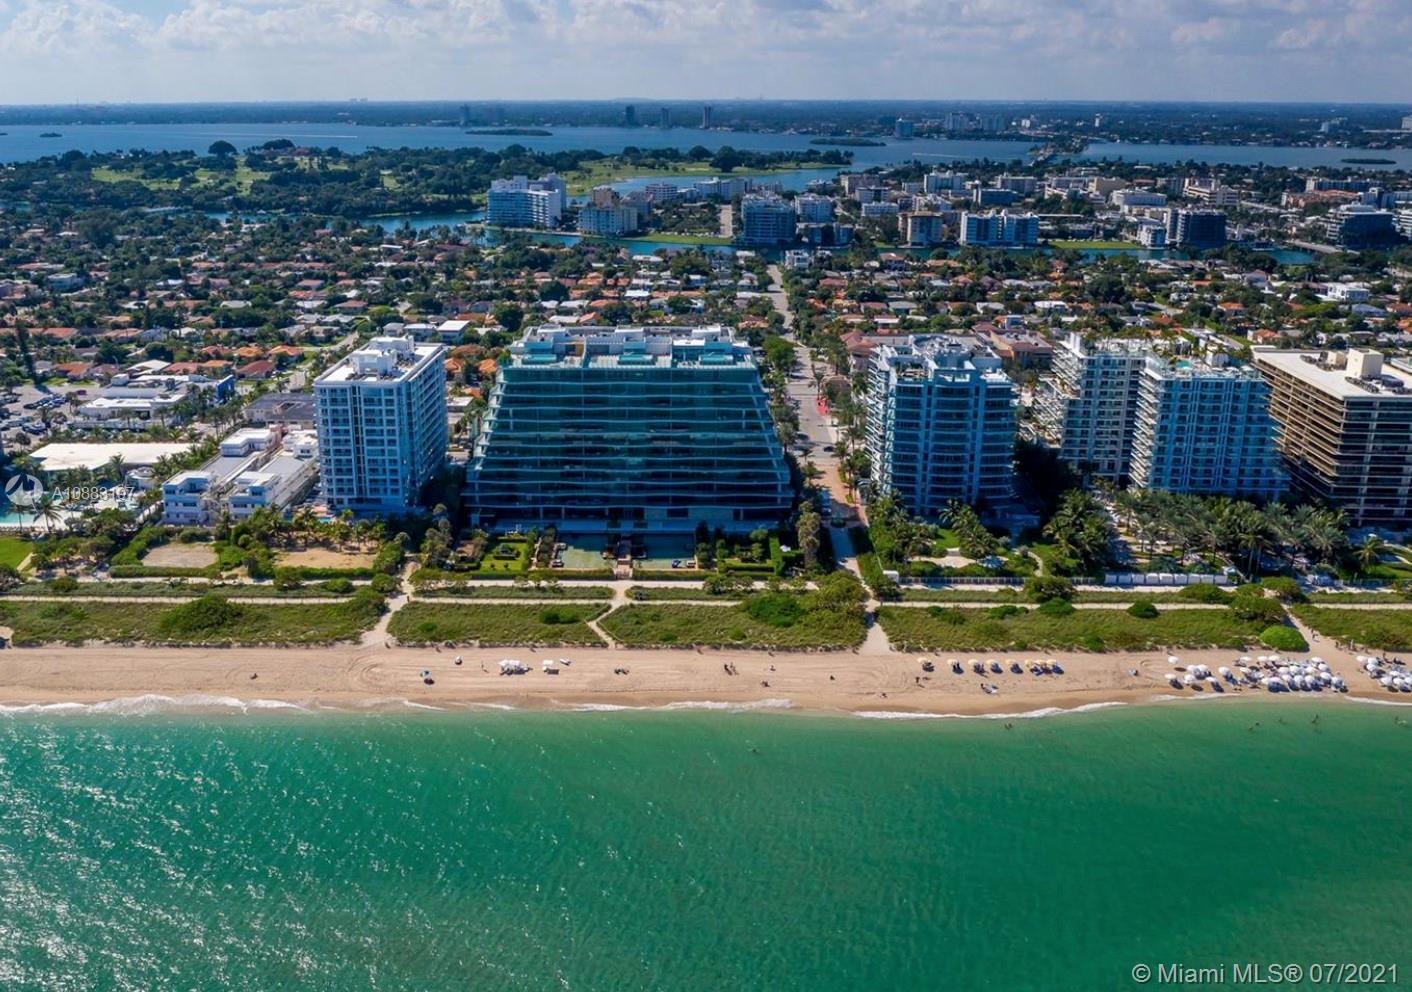 FENDI Chateau Residences, 9349 Collins Ave Unit 506, Surfside, Florida 33154, image 3